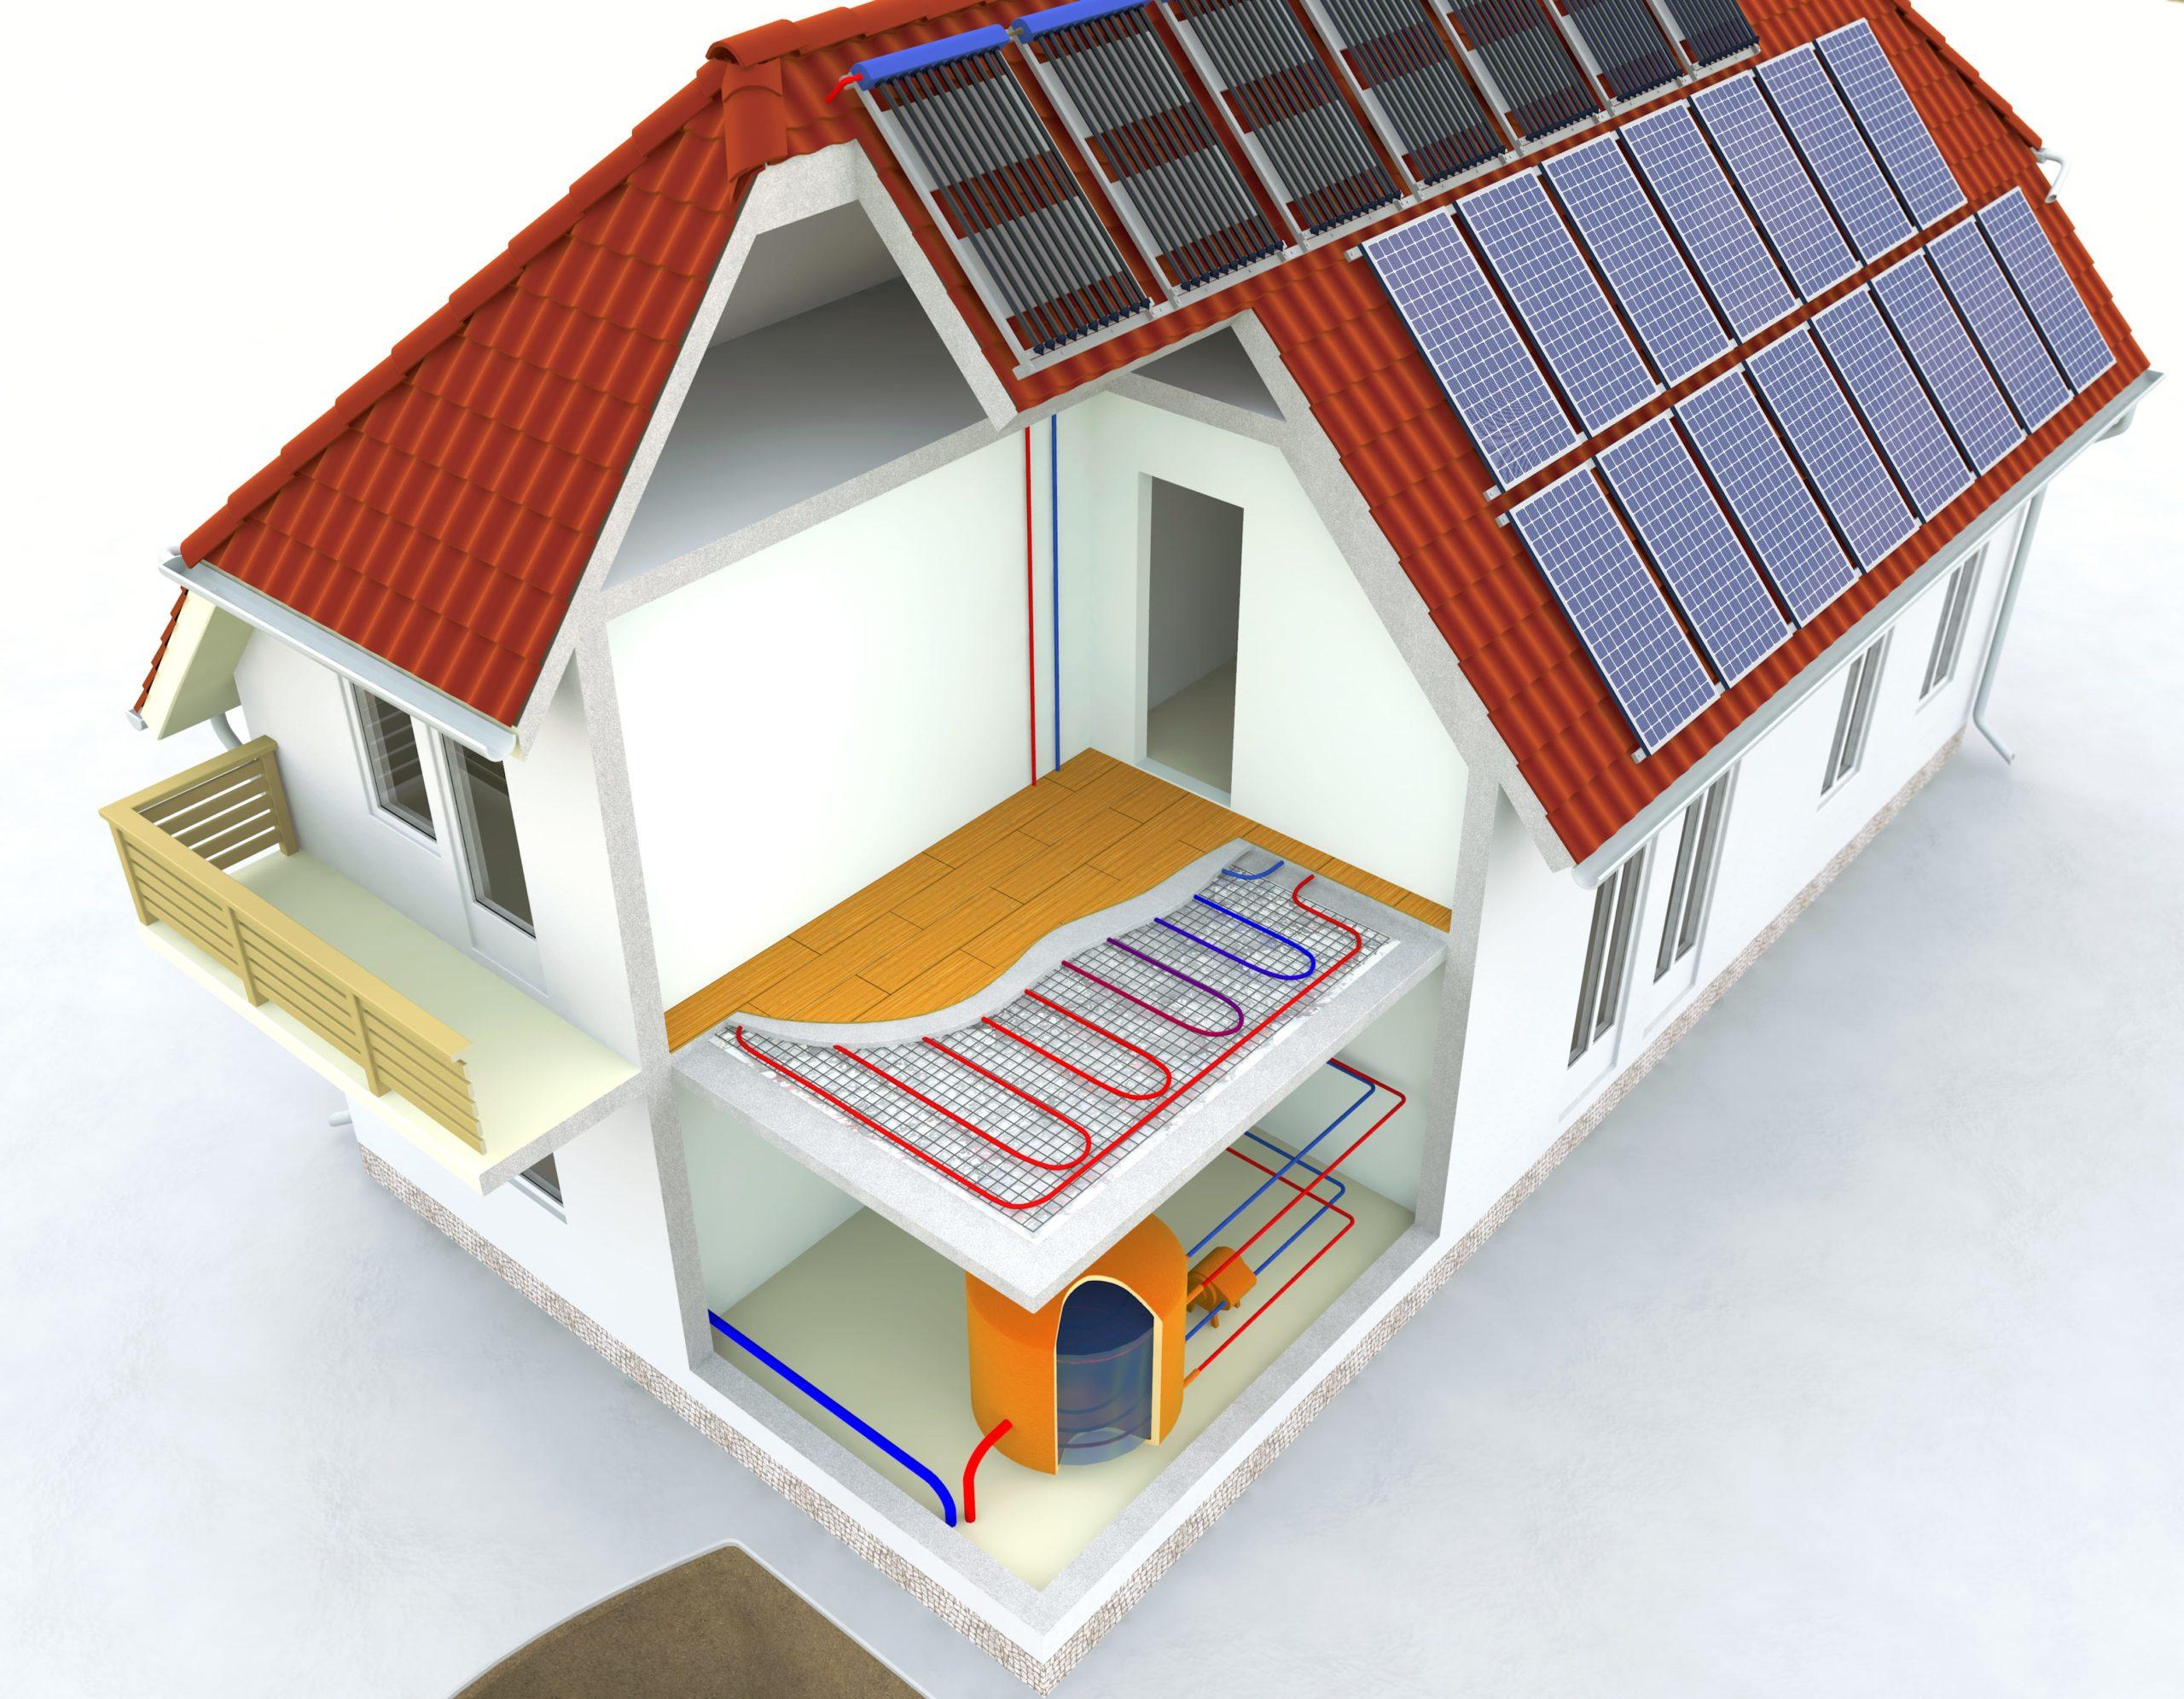 Sistema solar cooling